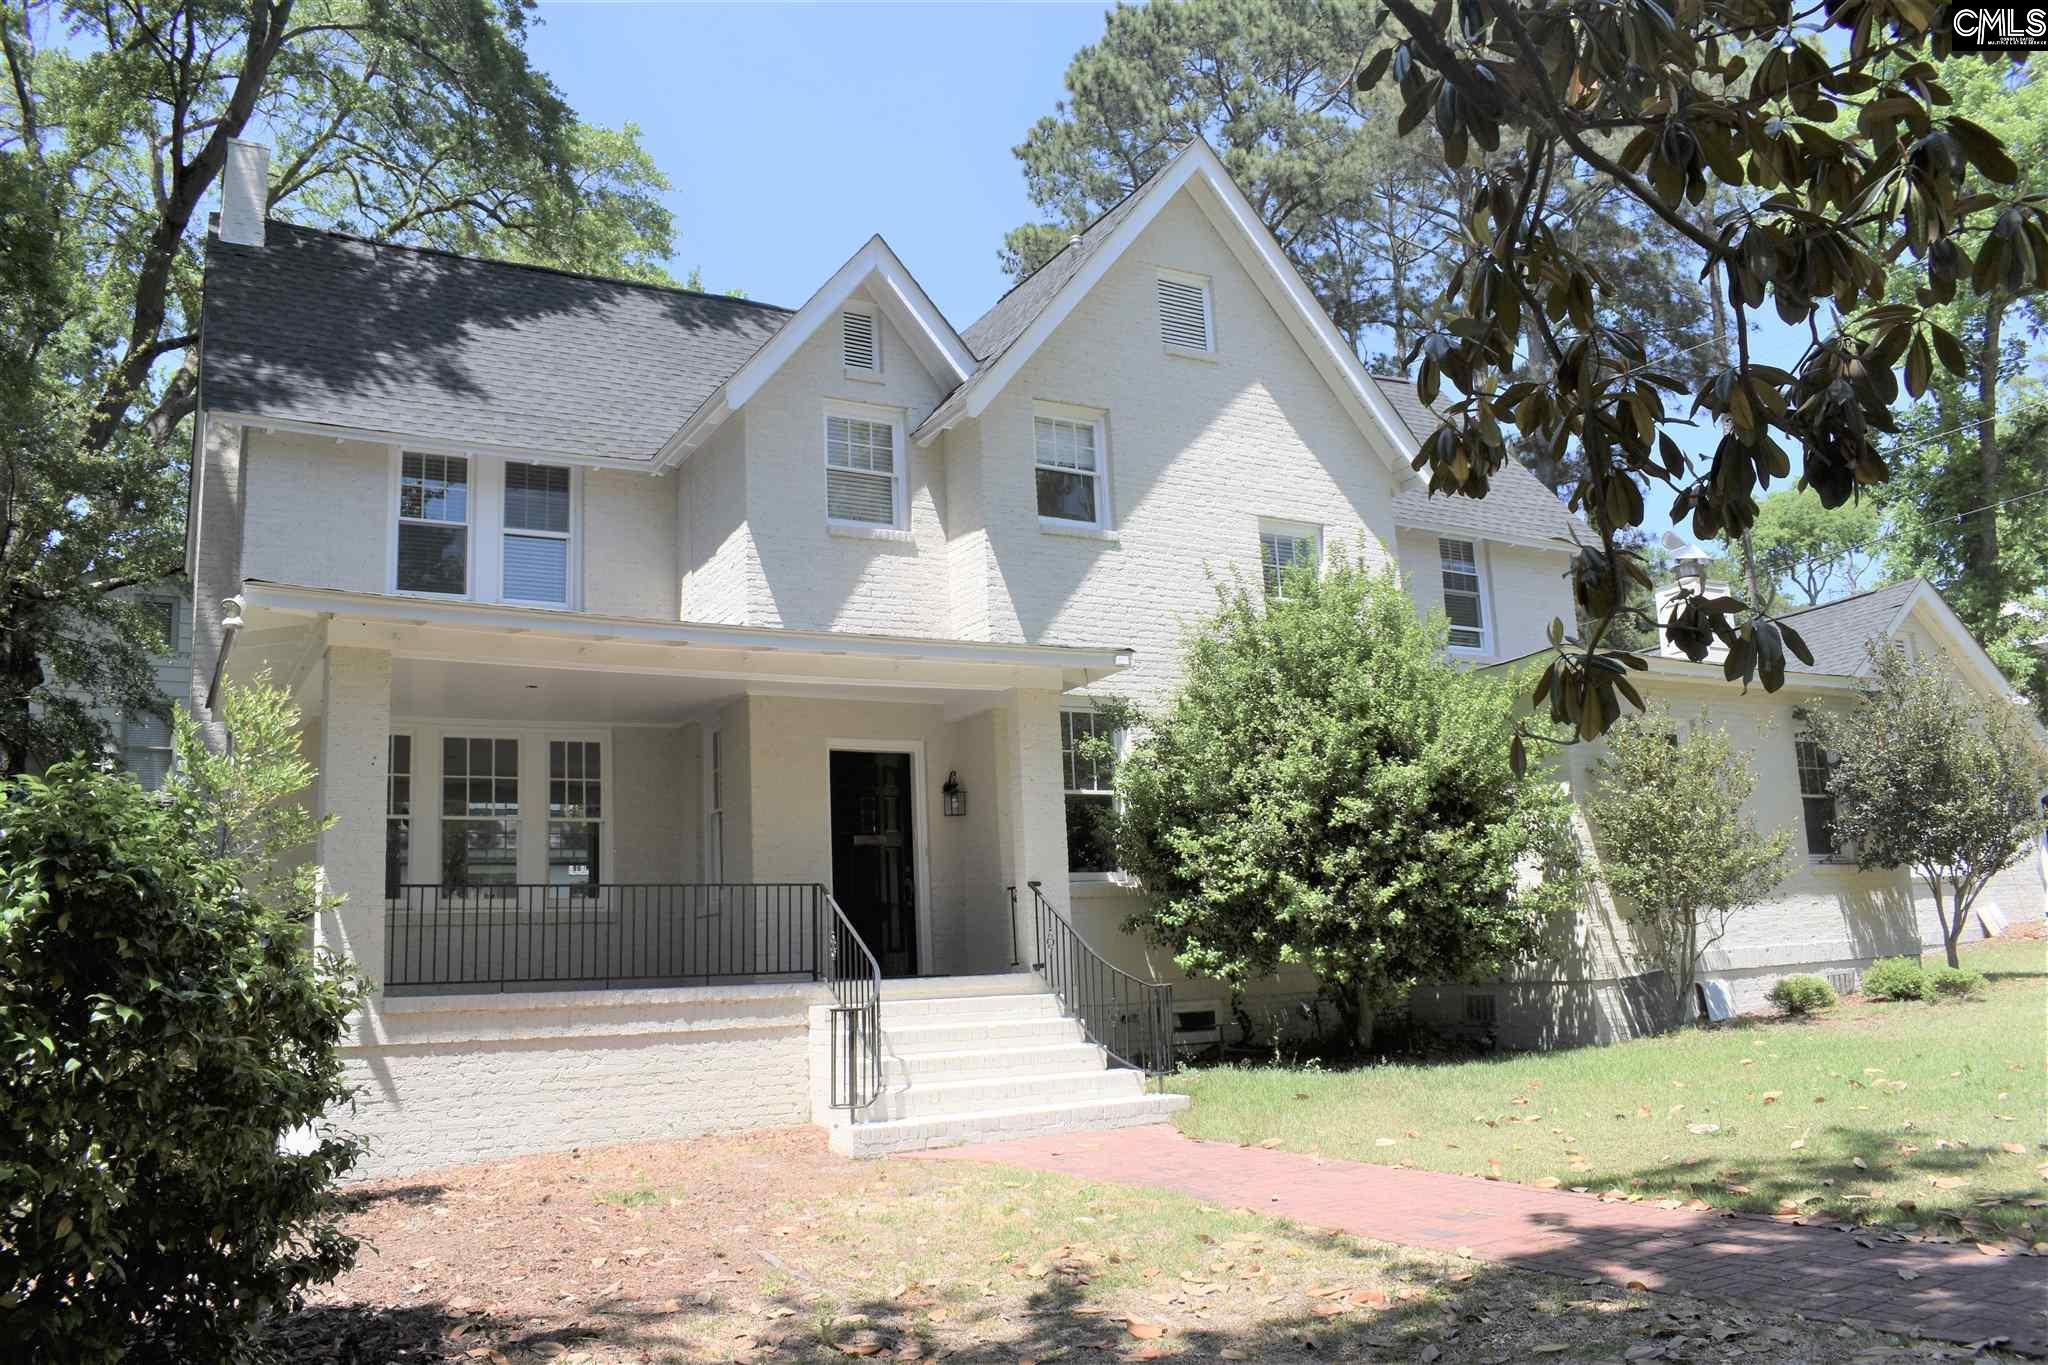 1705 Crestwood Columbia, SC 29205